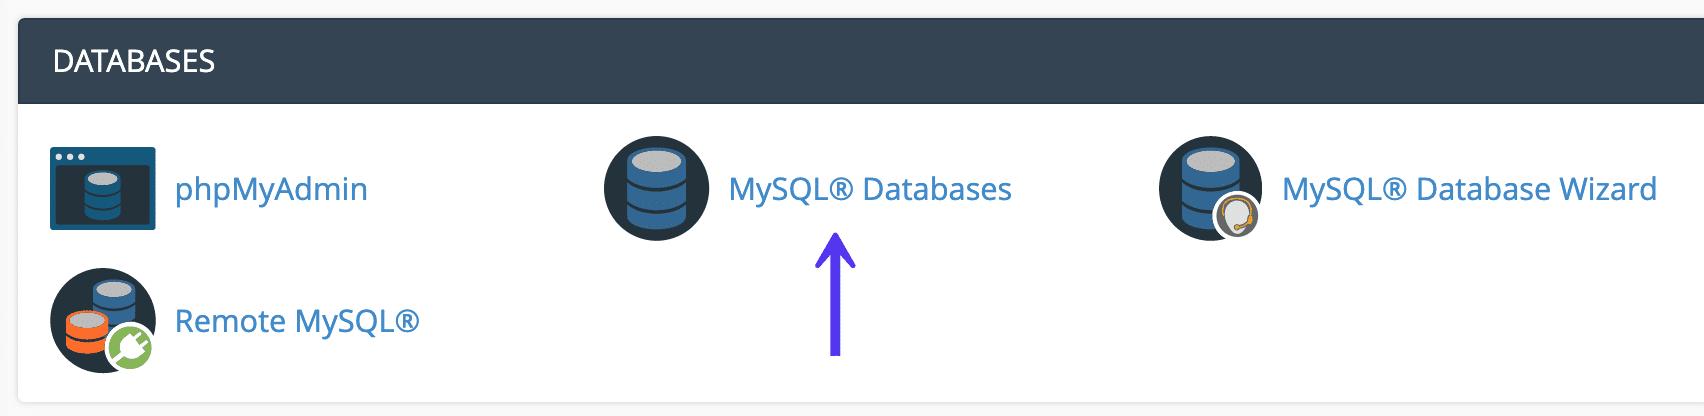 cPanel MySQL-databaser